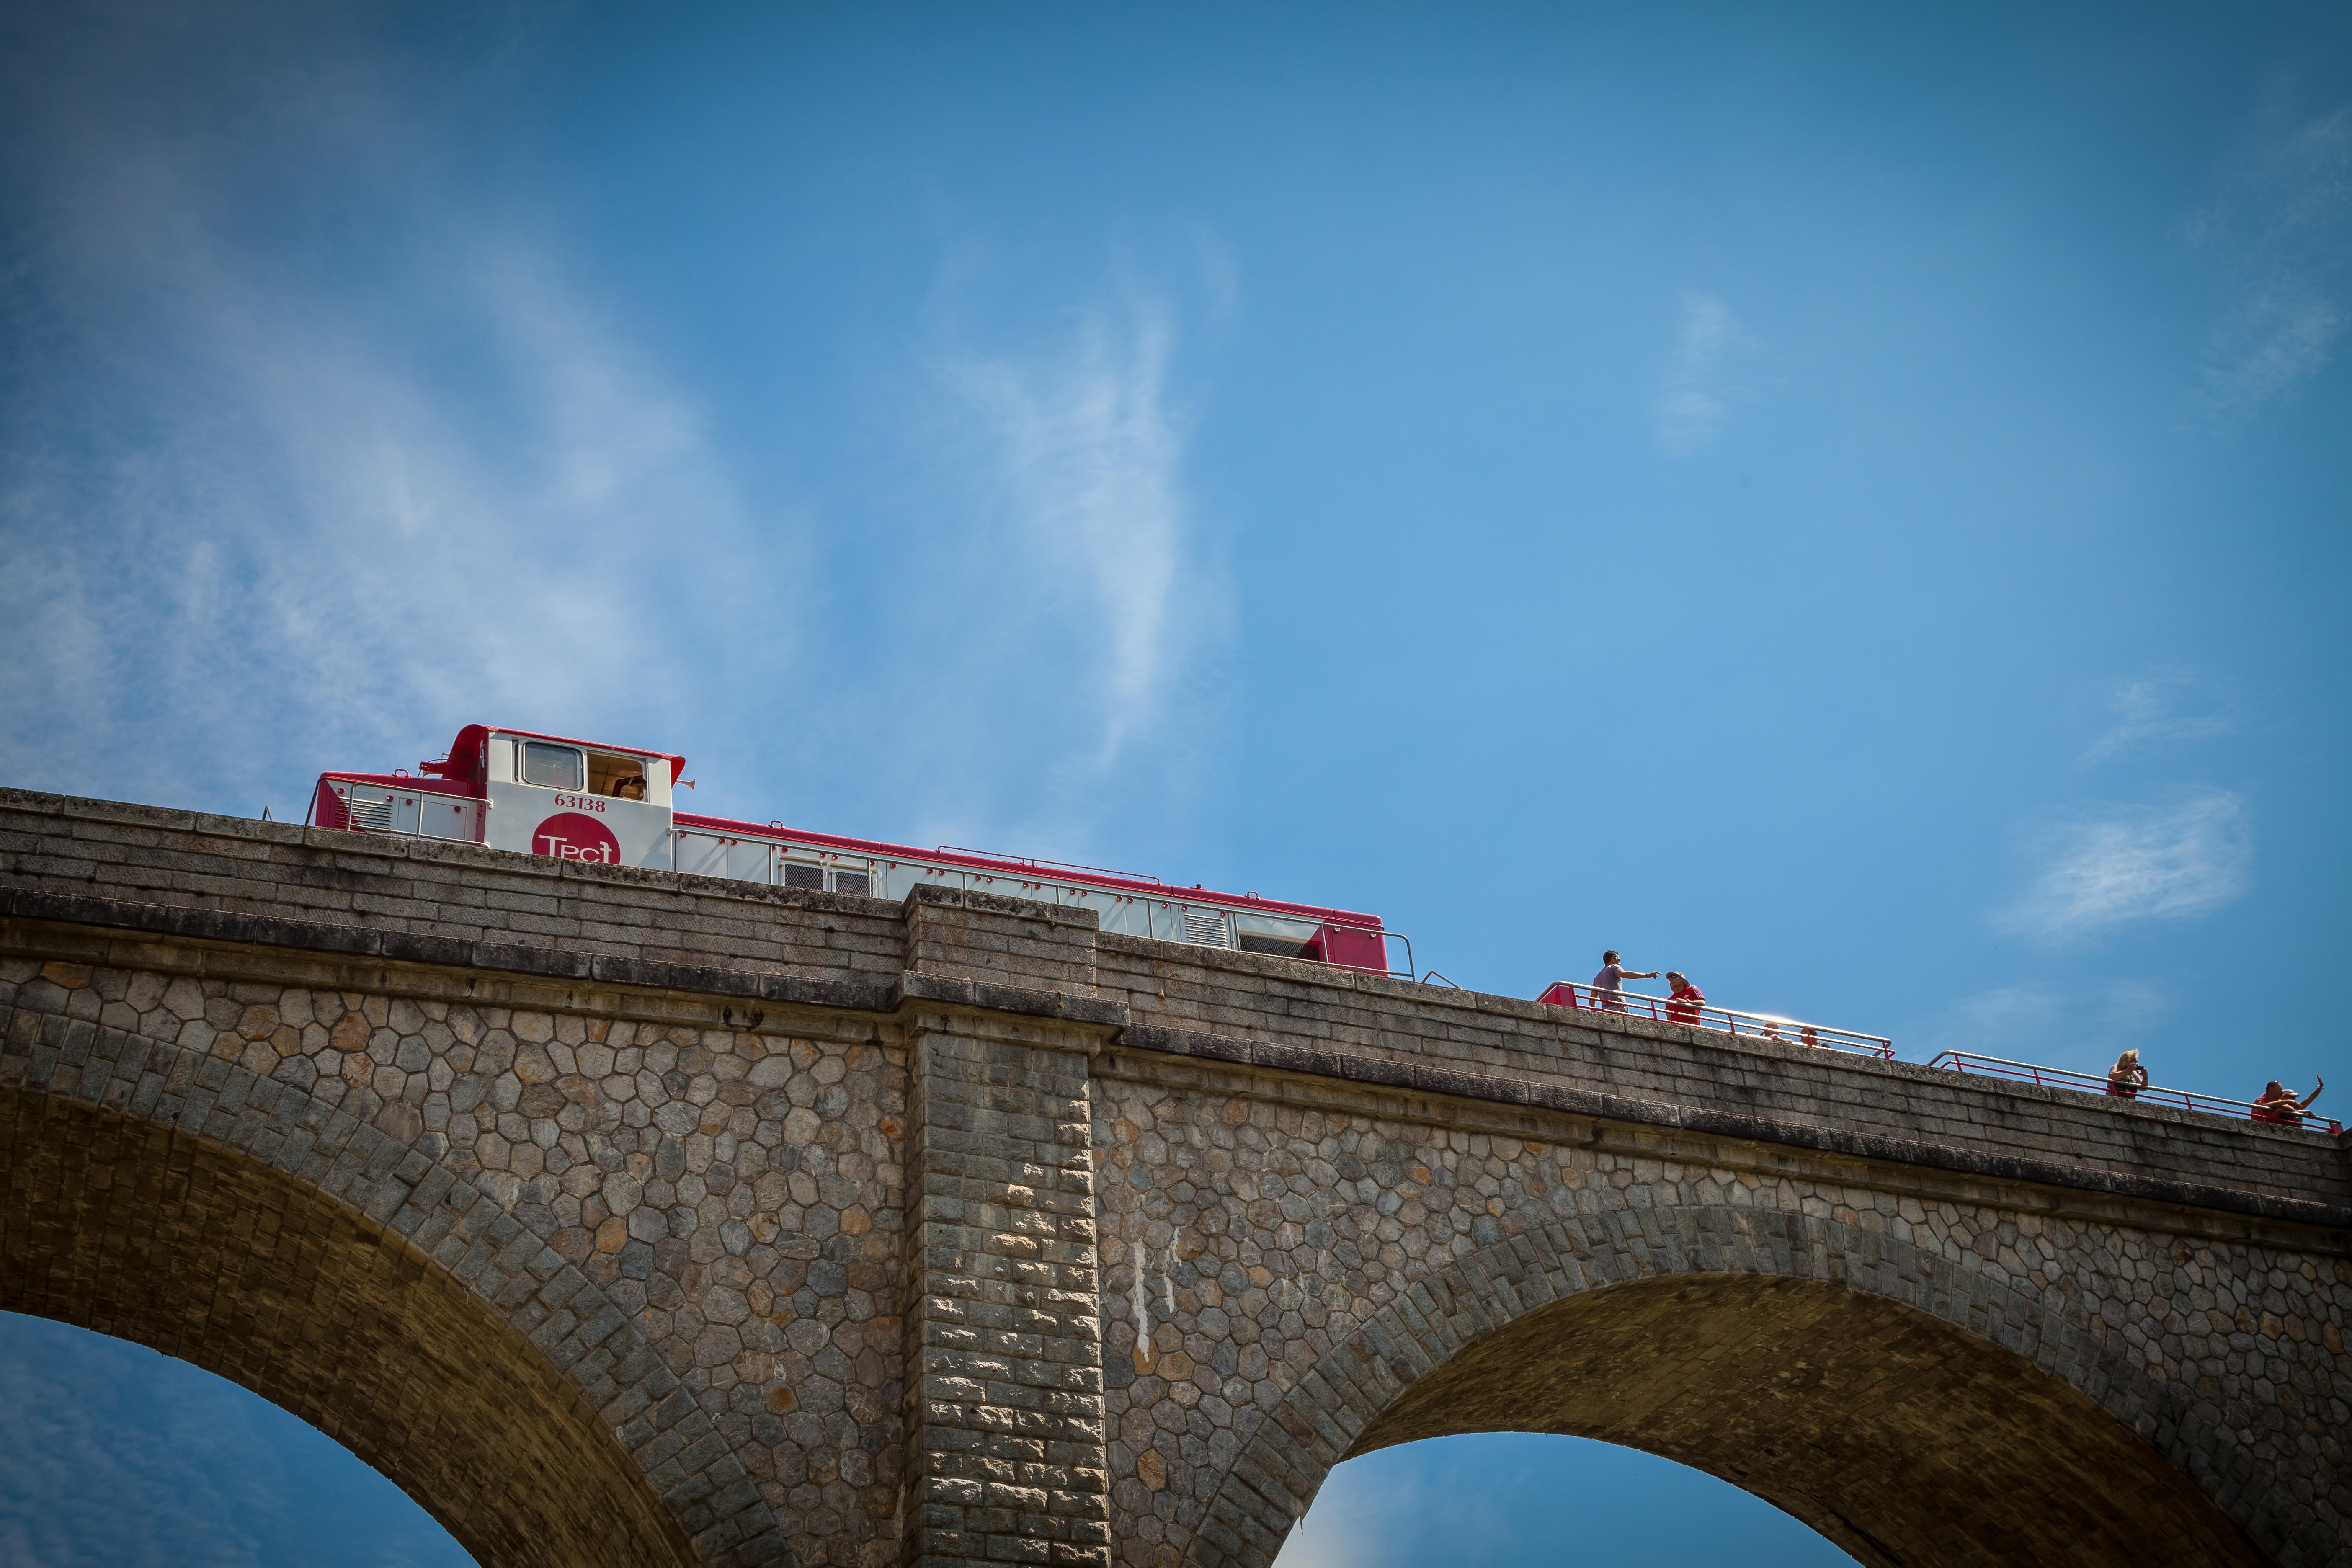 Train decouvert viaduc La Cremade1